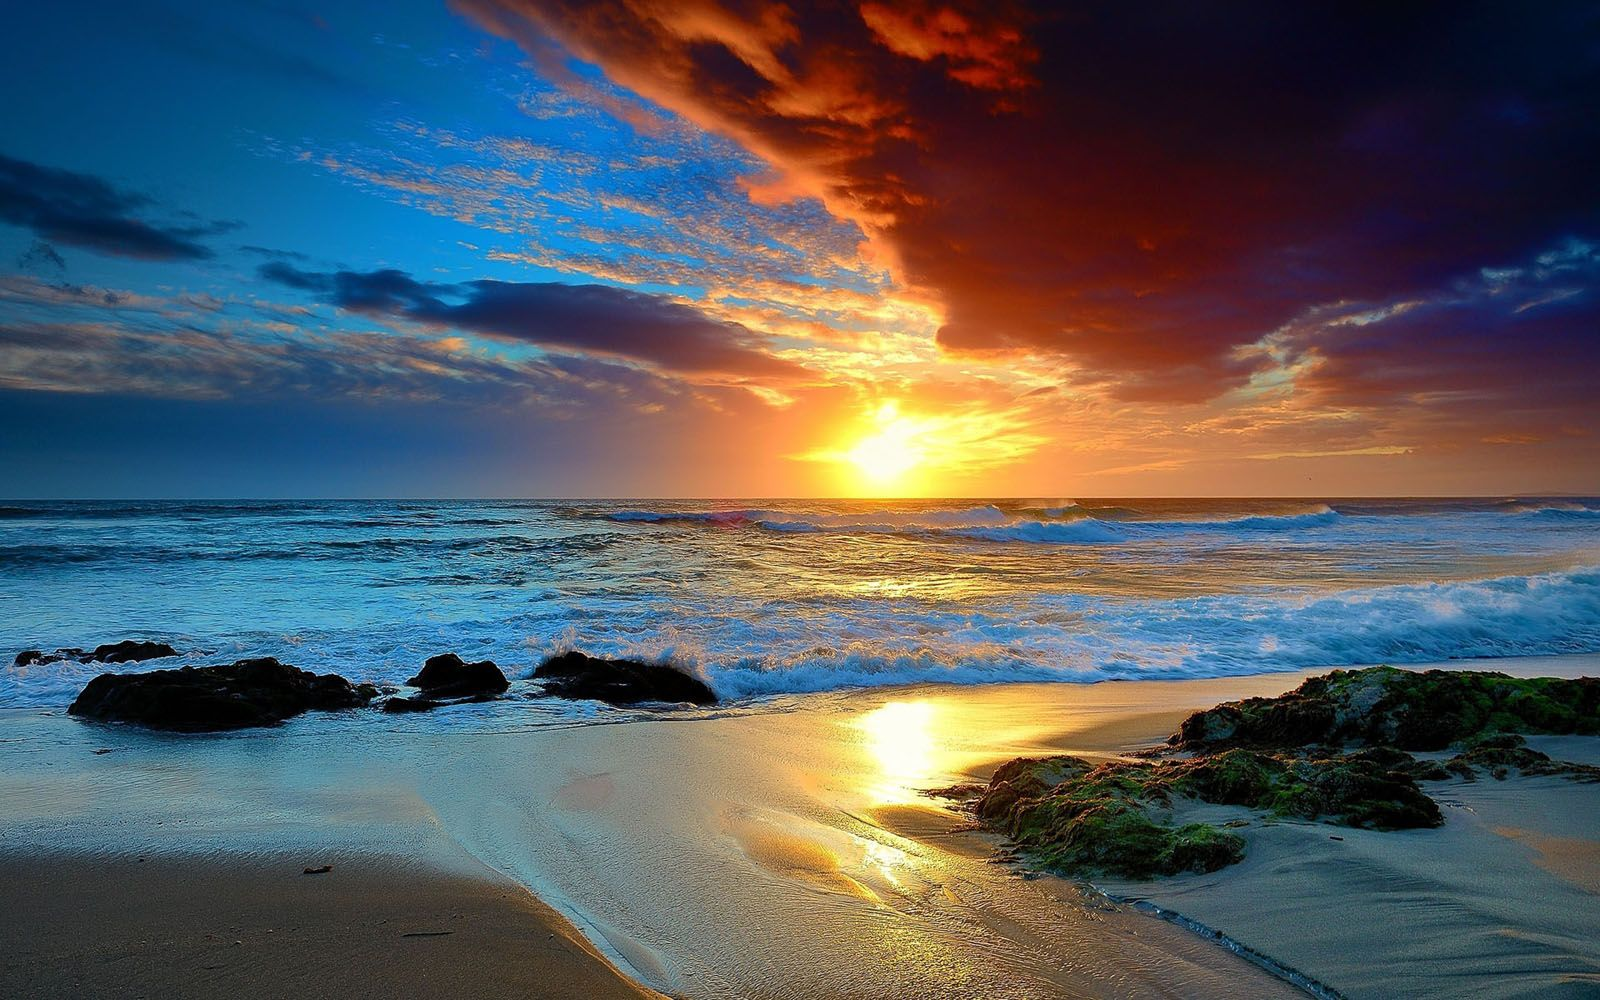 Landscape Ocean Beach